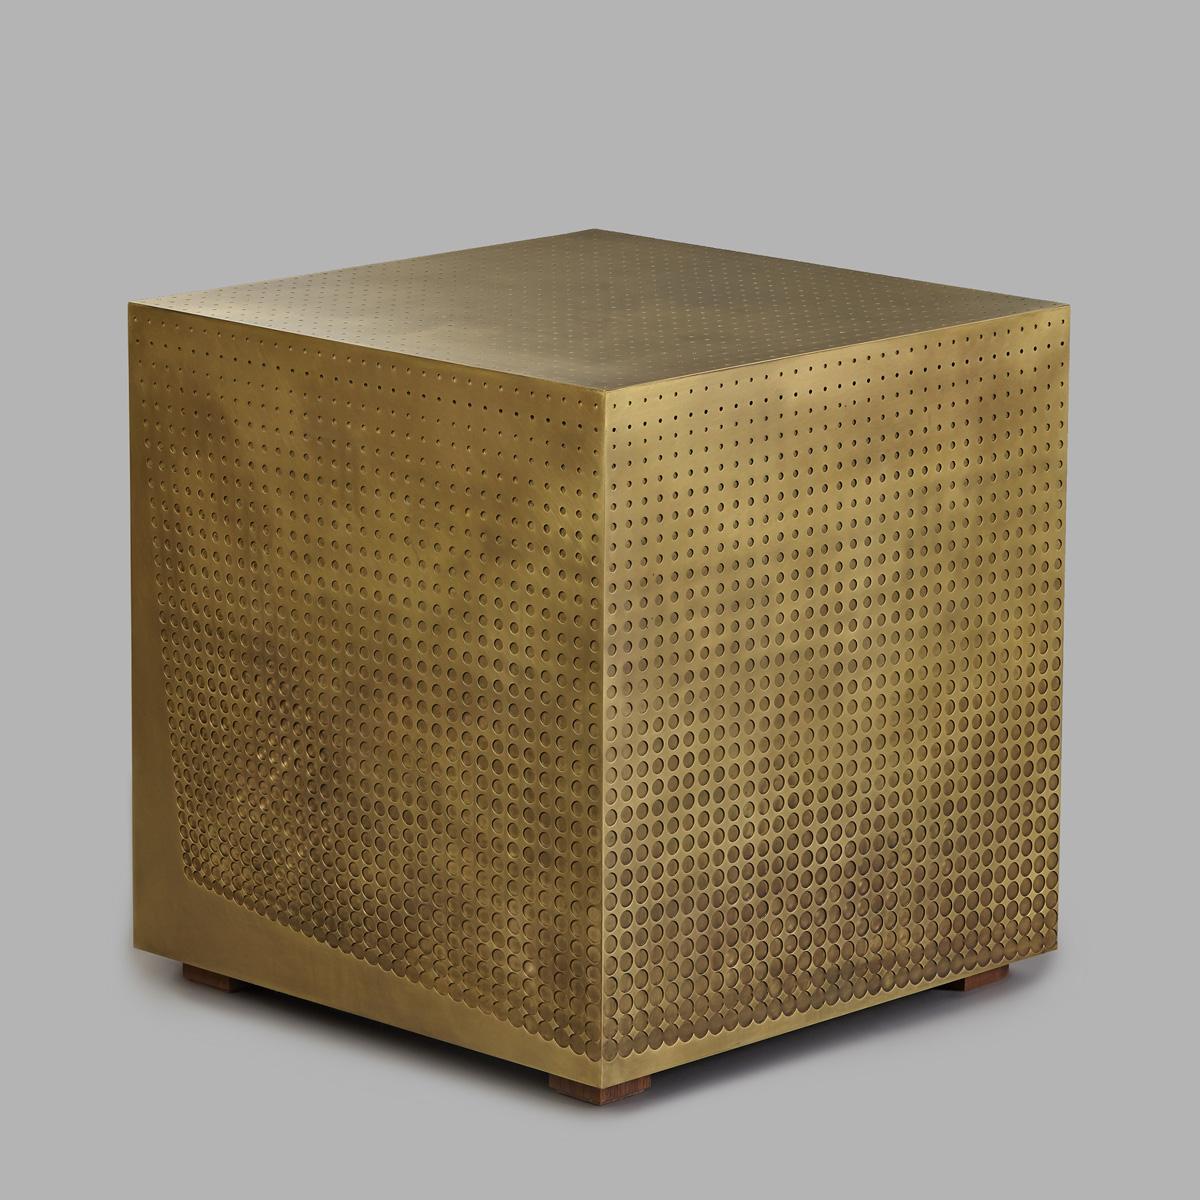 01_Cube.jpg